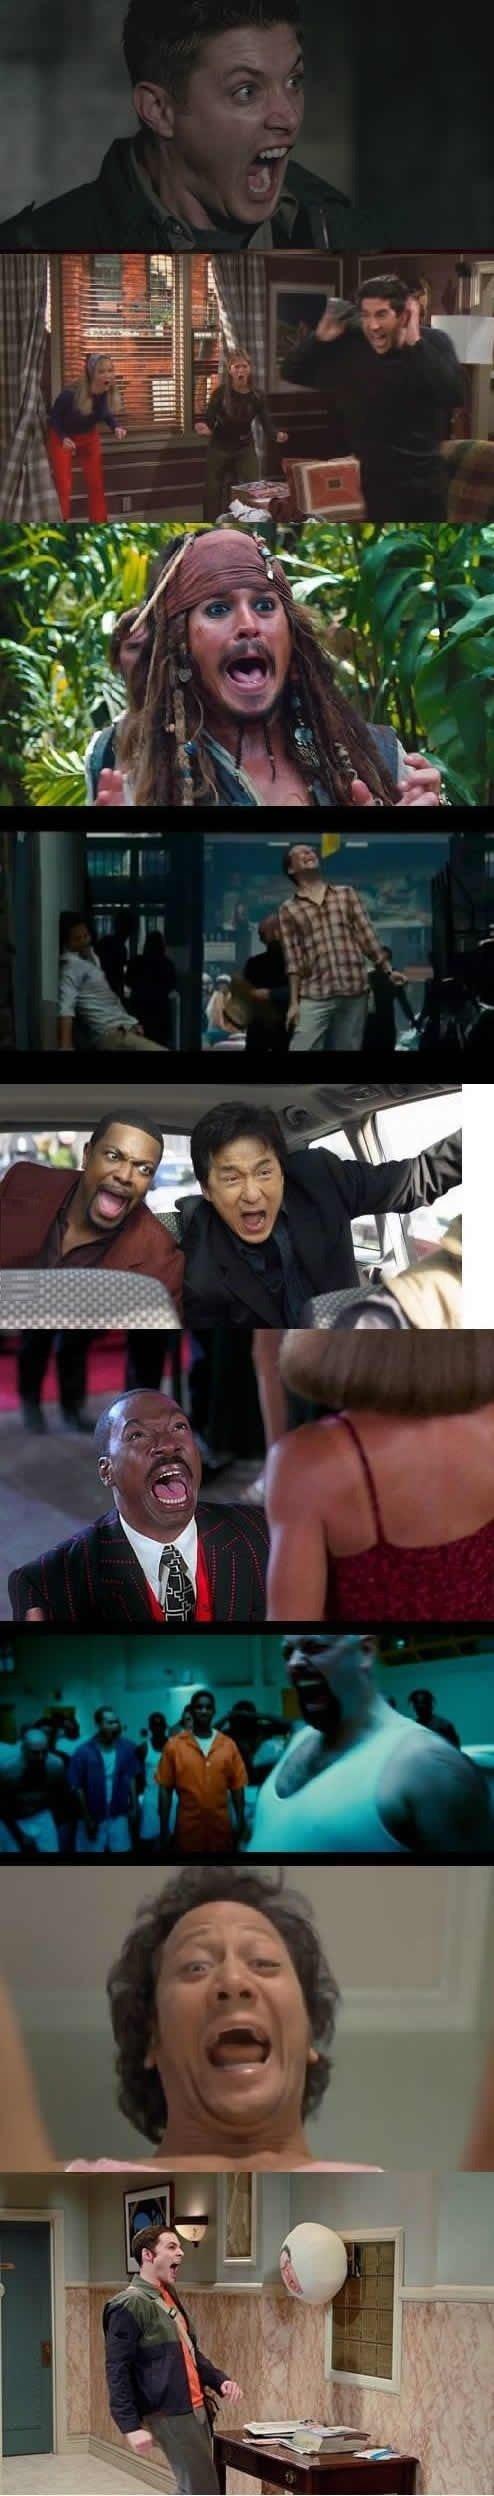 Hilarious freakouts. .